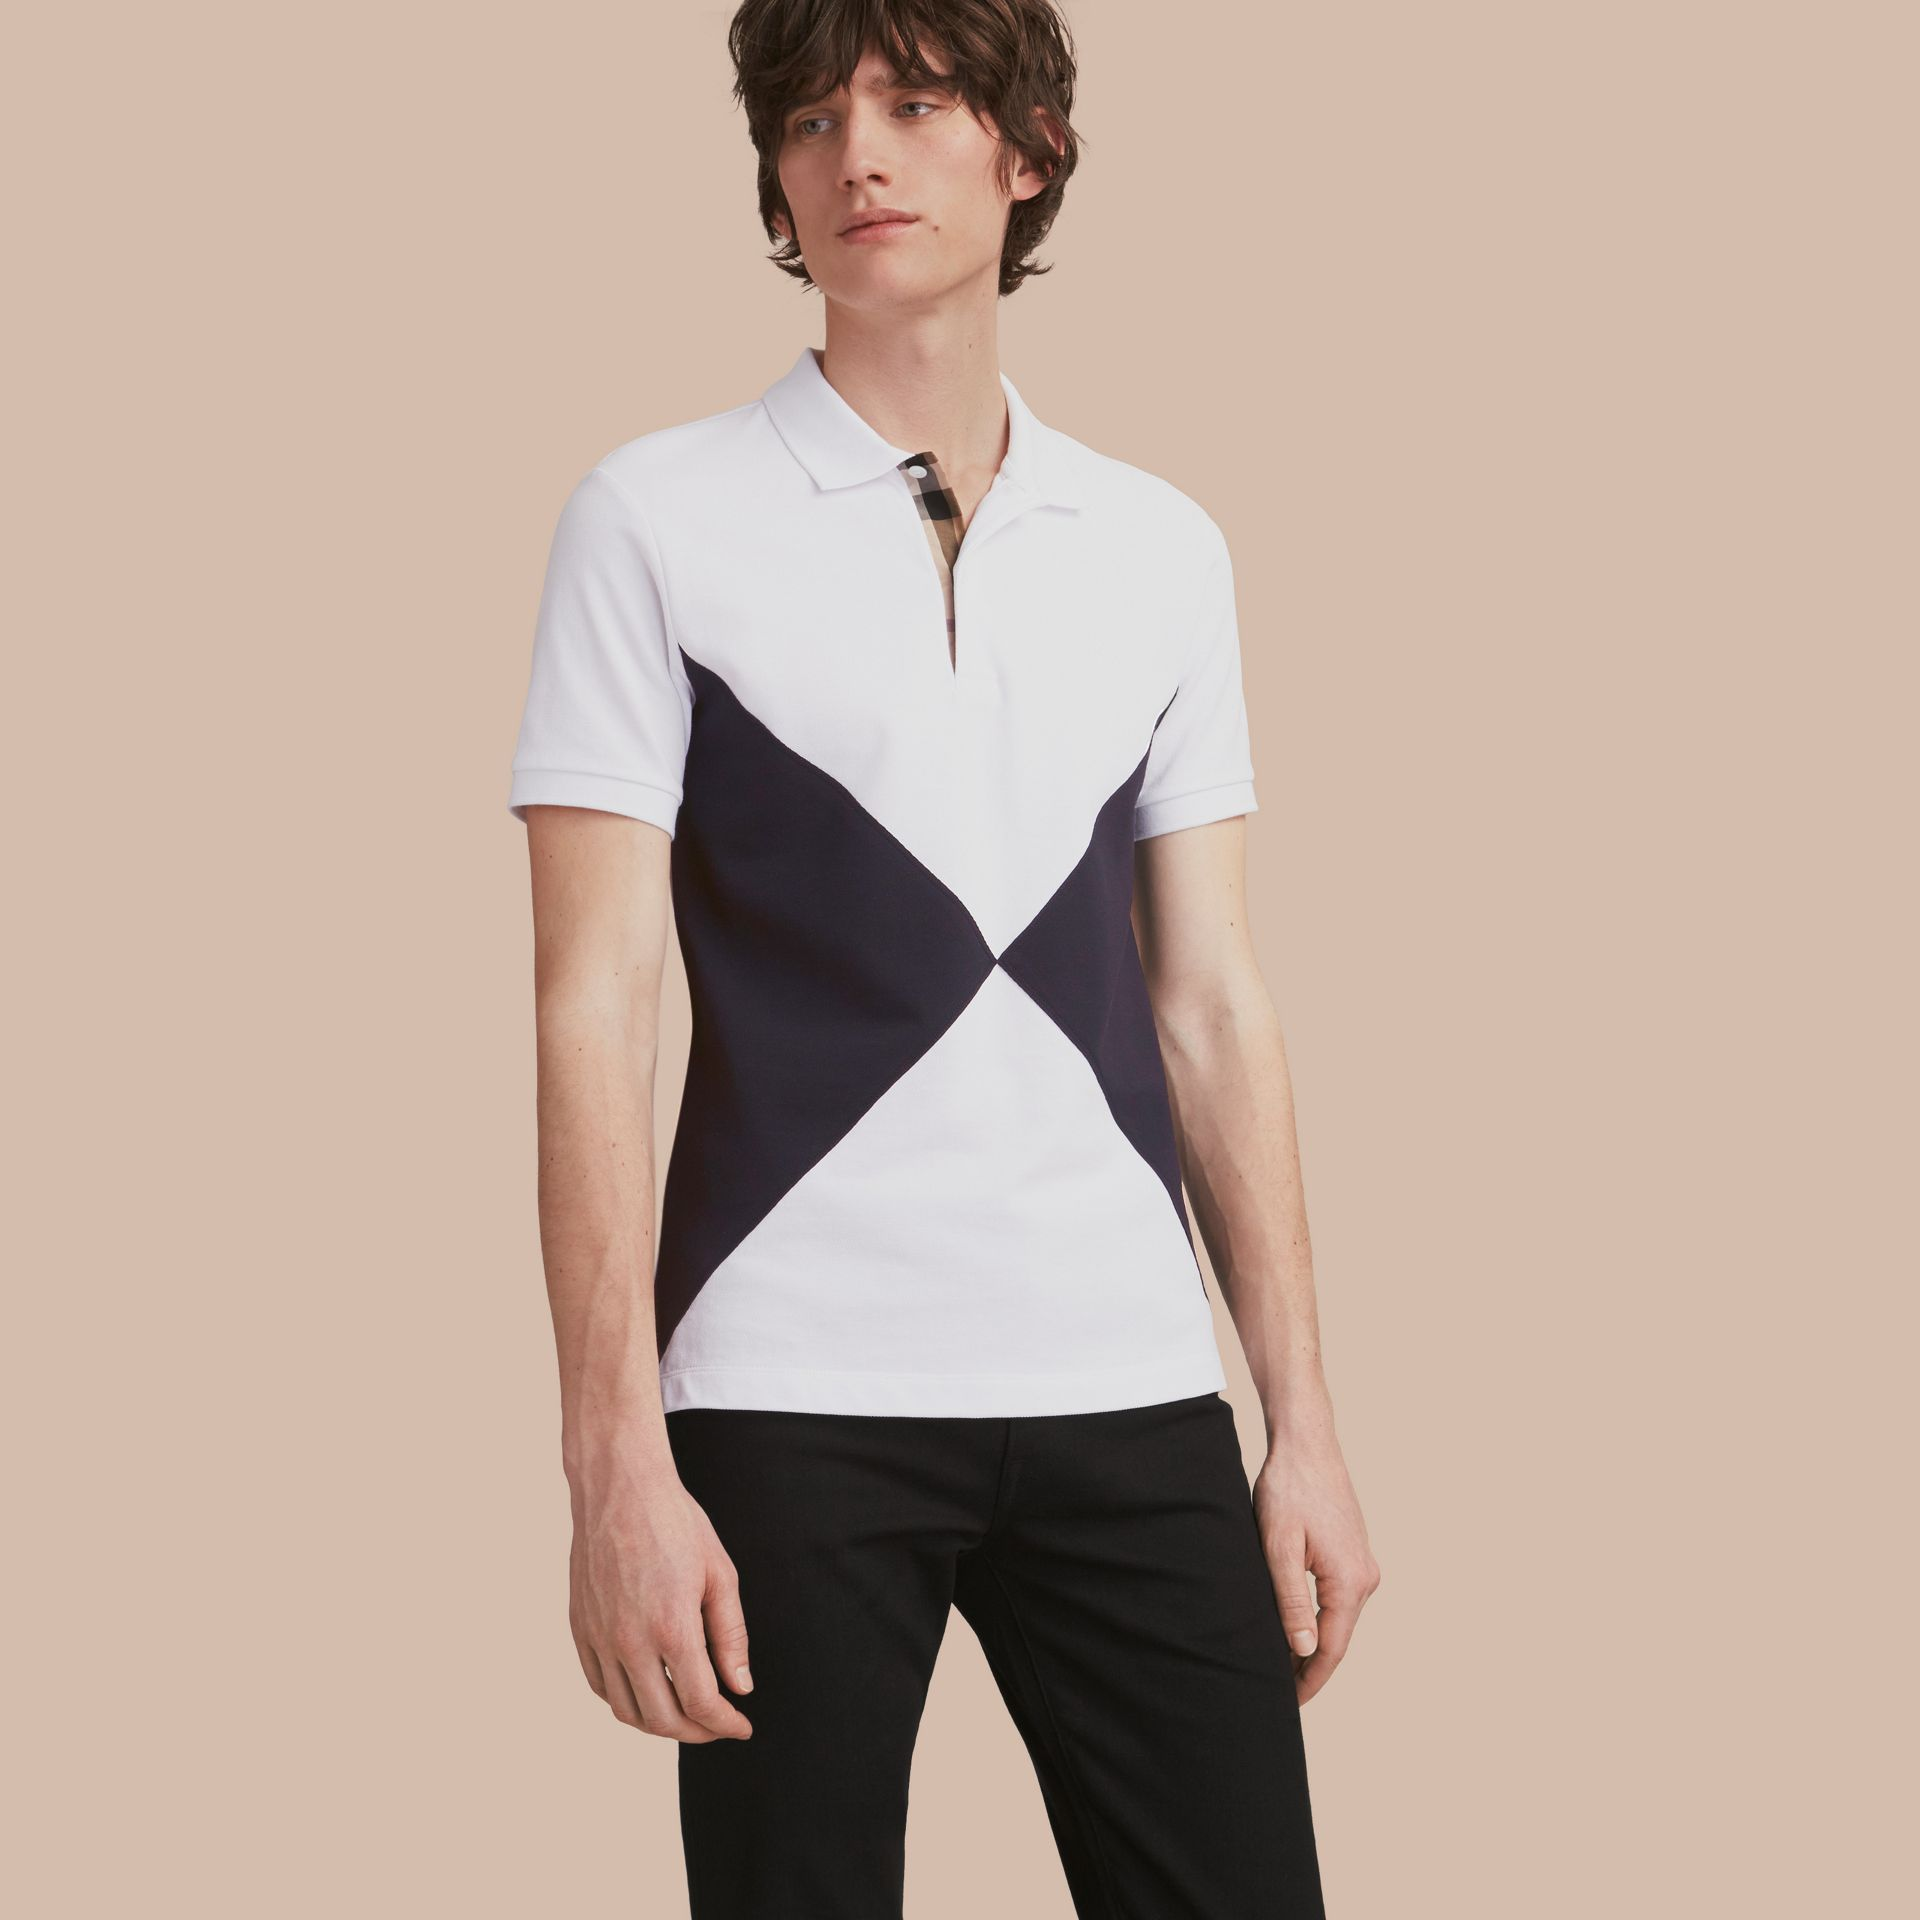 Geometric Motif Cotton Piqué Polo Shirt with Check Placket White - gallery image 1